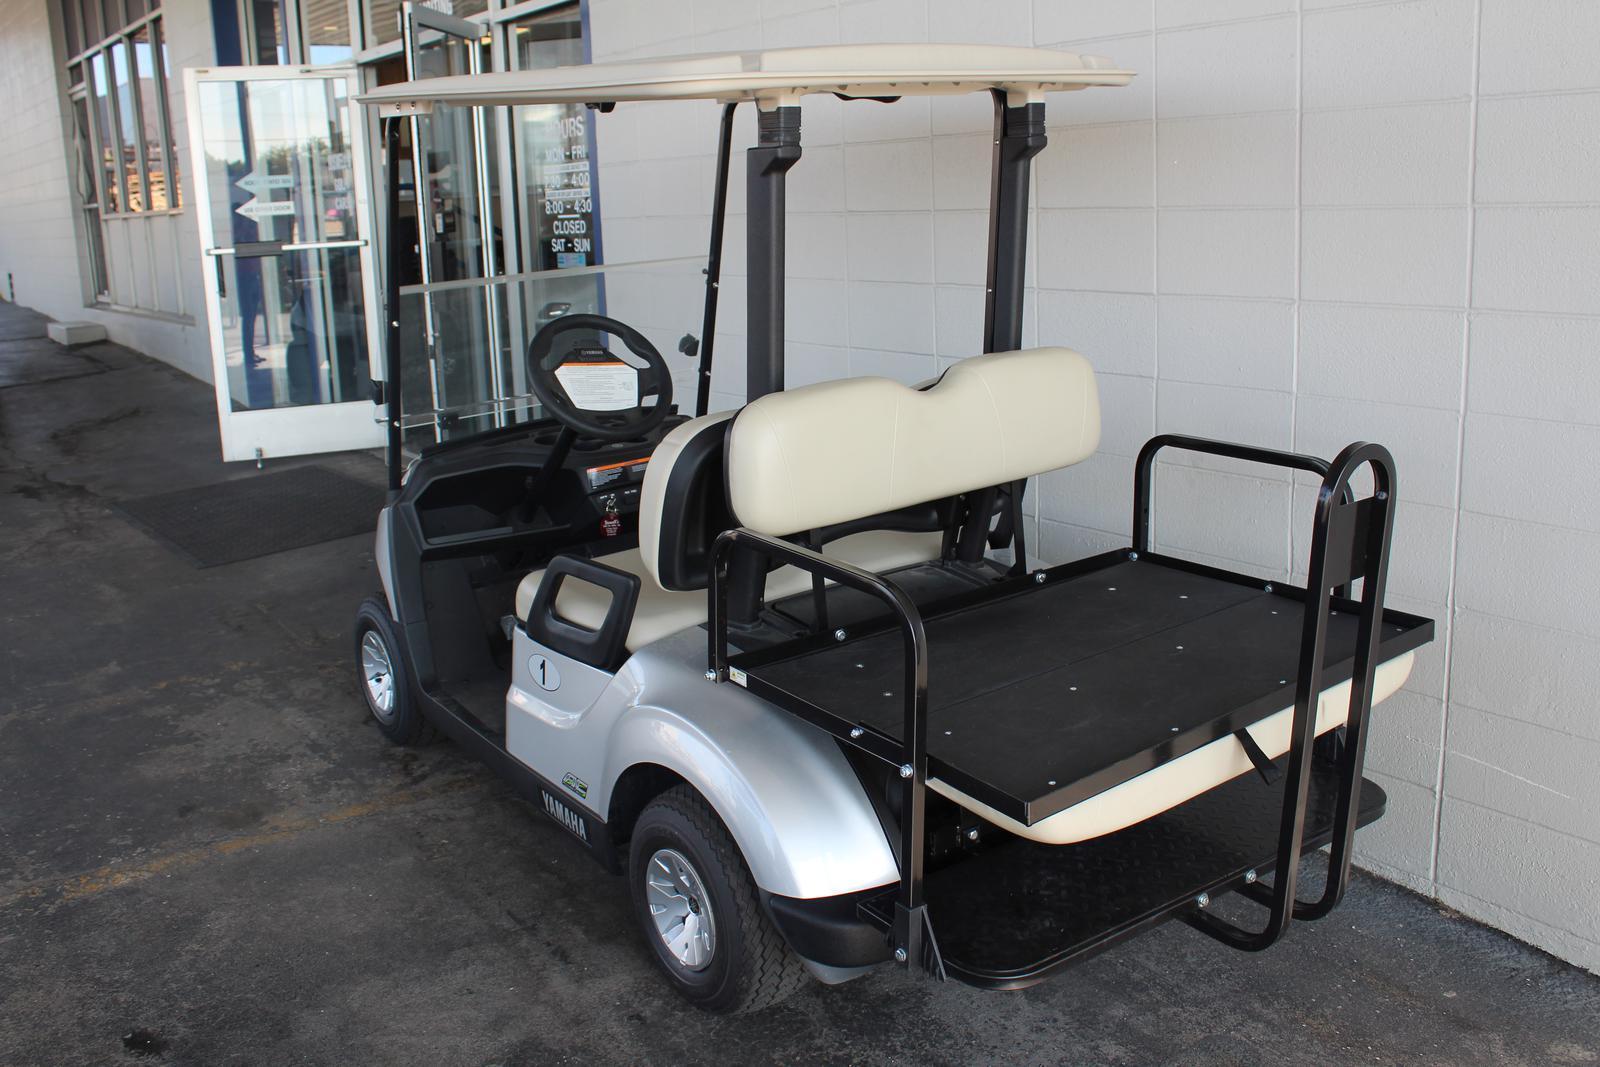 2018 Yamaha Drive 2 Powertech A/C for sale in Nashville, TN ... on rxv golf cart, yamaha g14 golf cart, 2008 yamaha golf cart, yamaha g29 golf cart, 1995 yamaha golf cart, antique looking golf cart, tomberlin e-merge golf cart, yamaha sun classic golf cart, yamaha adventurer golf carts, yamaha gas golf cart, hornet golf cart, yamaha golf cart parts and accessories, sliding windshield for golf cart, yamaha golf cart parts online, 98 yamaha golf cart, 2009 yamaha drive gas cart, yamaha g8 golf cart, solorider golf cart, yamaha golf cart blue, yamaha g2 golf cart,